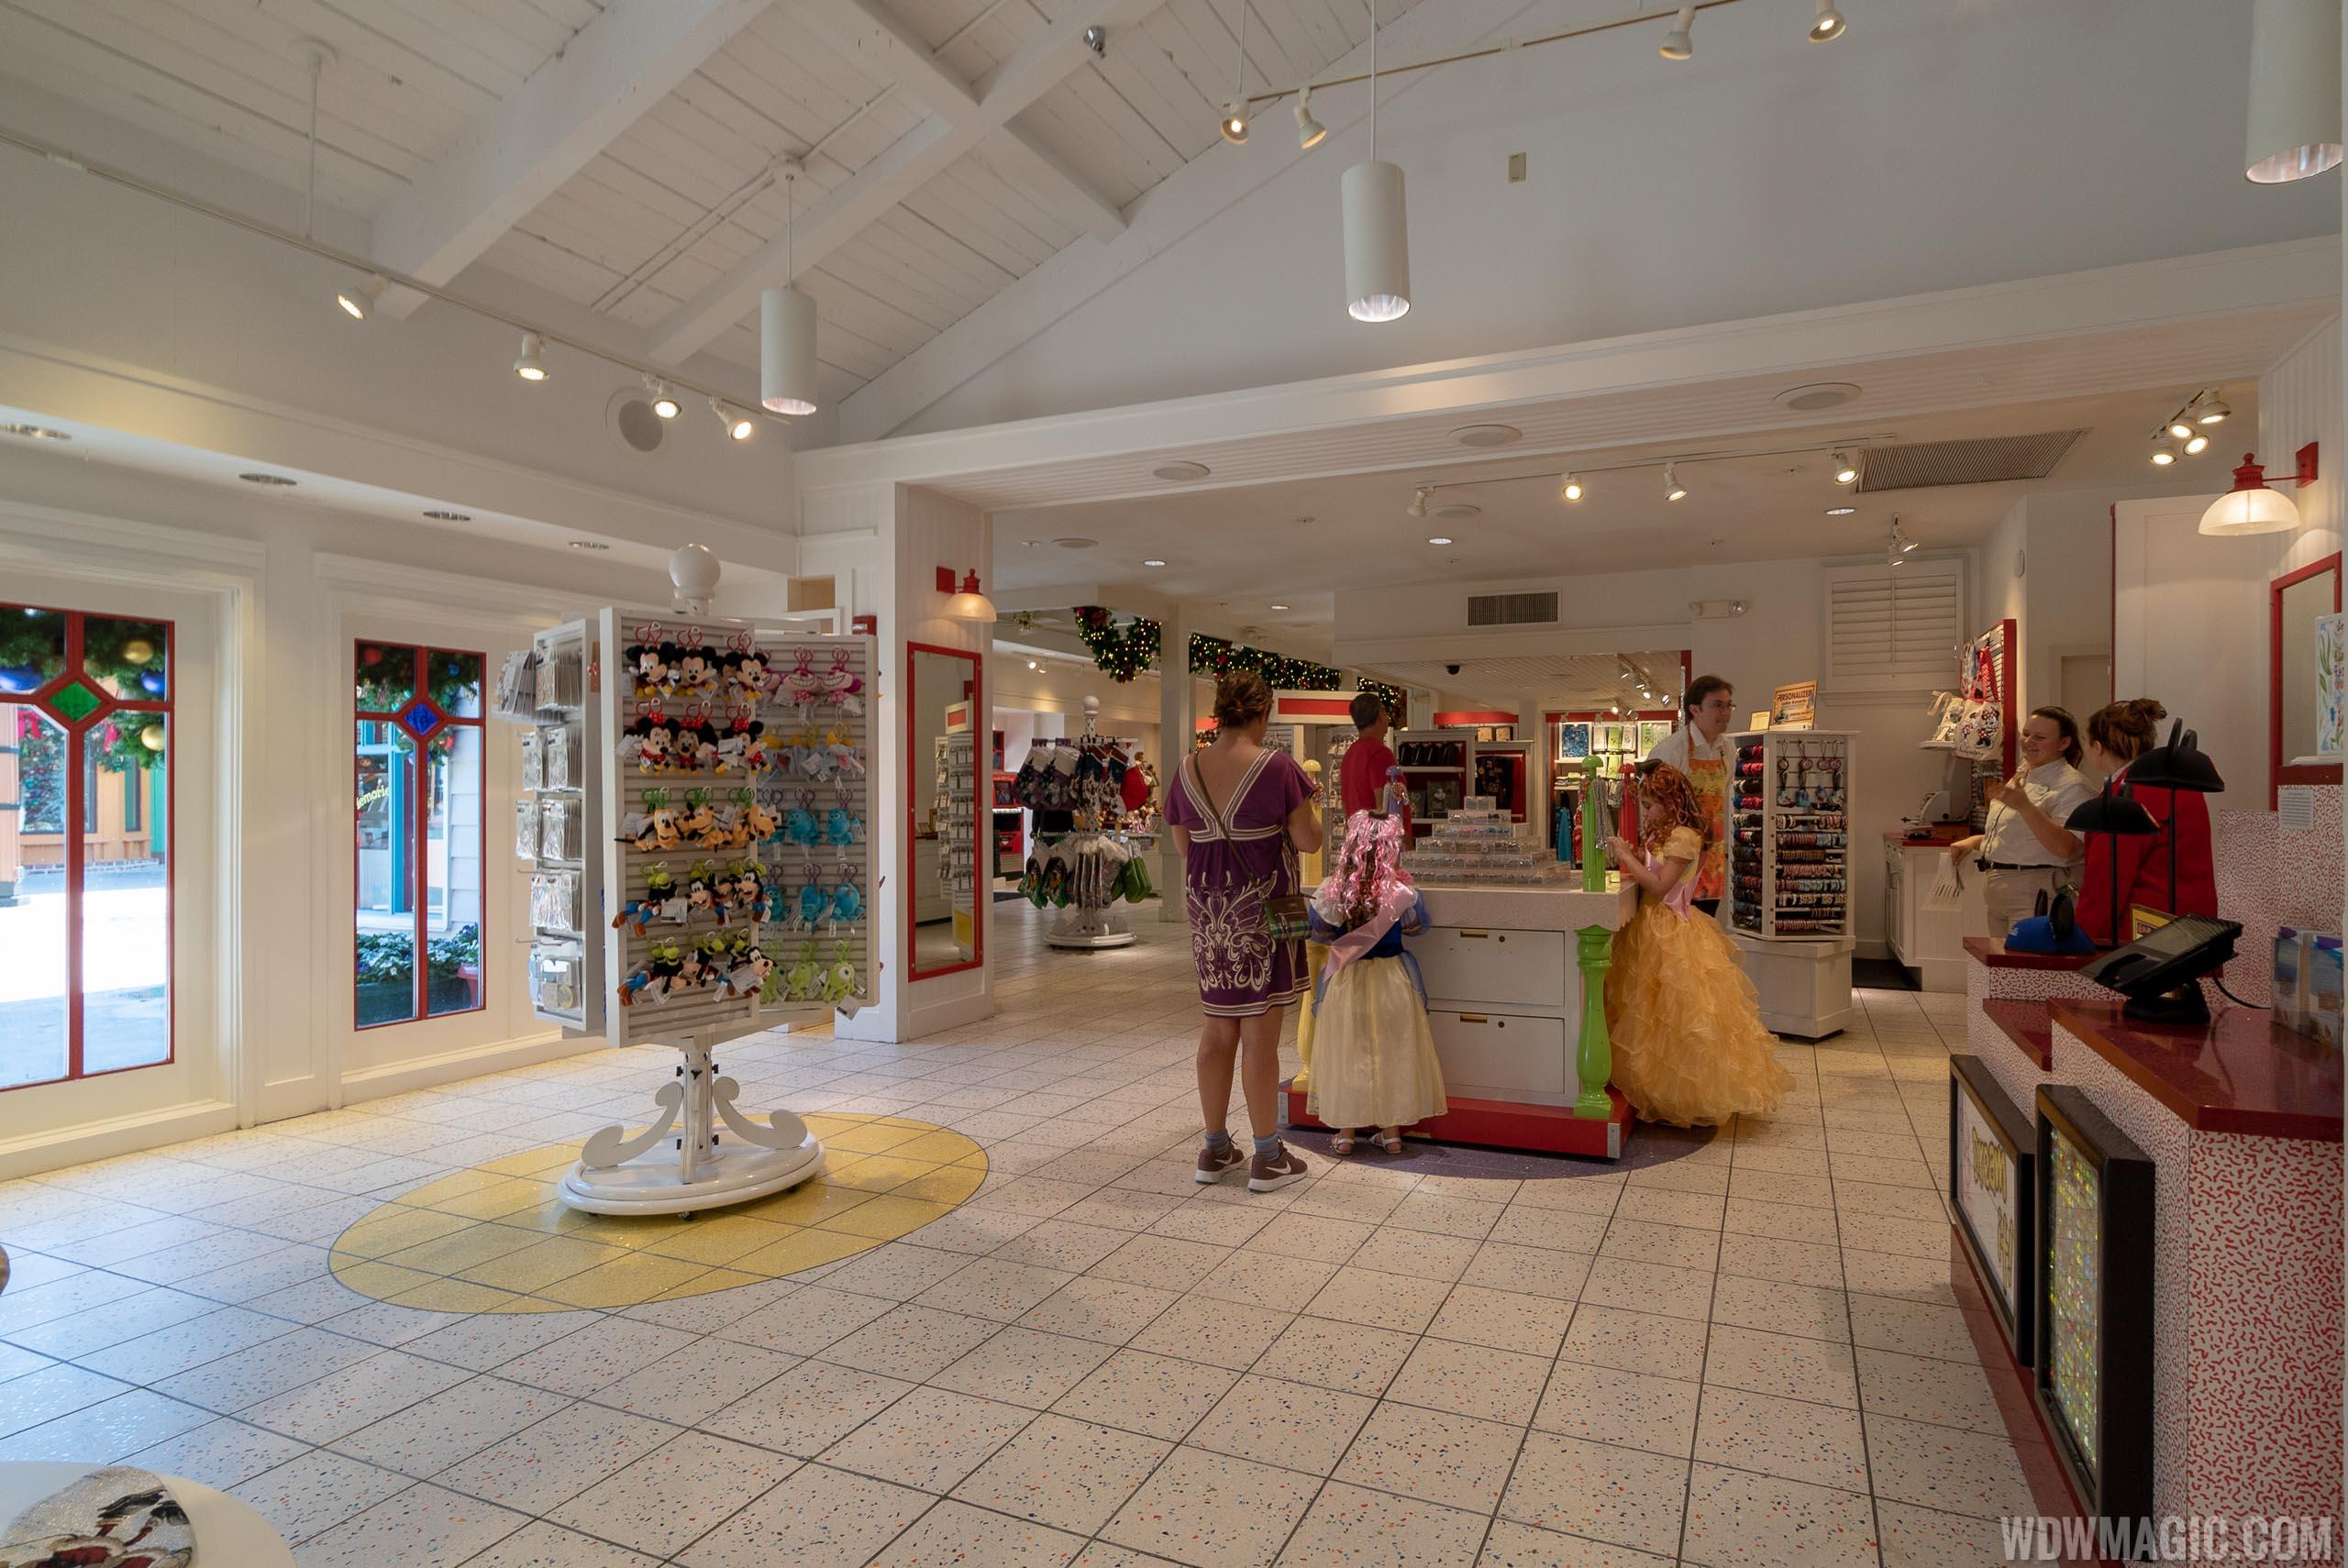 Disney's Wonderful World of Memories extended space